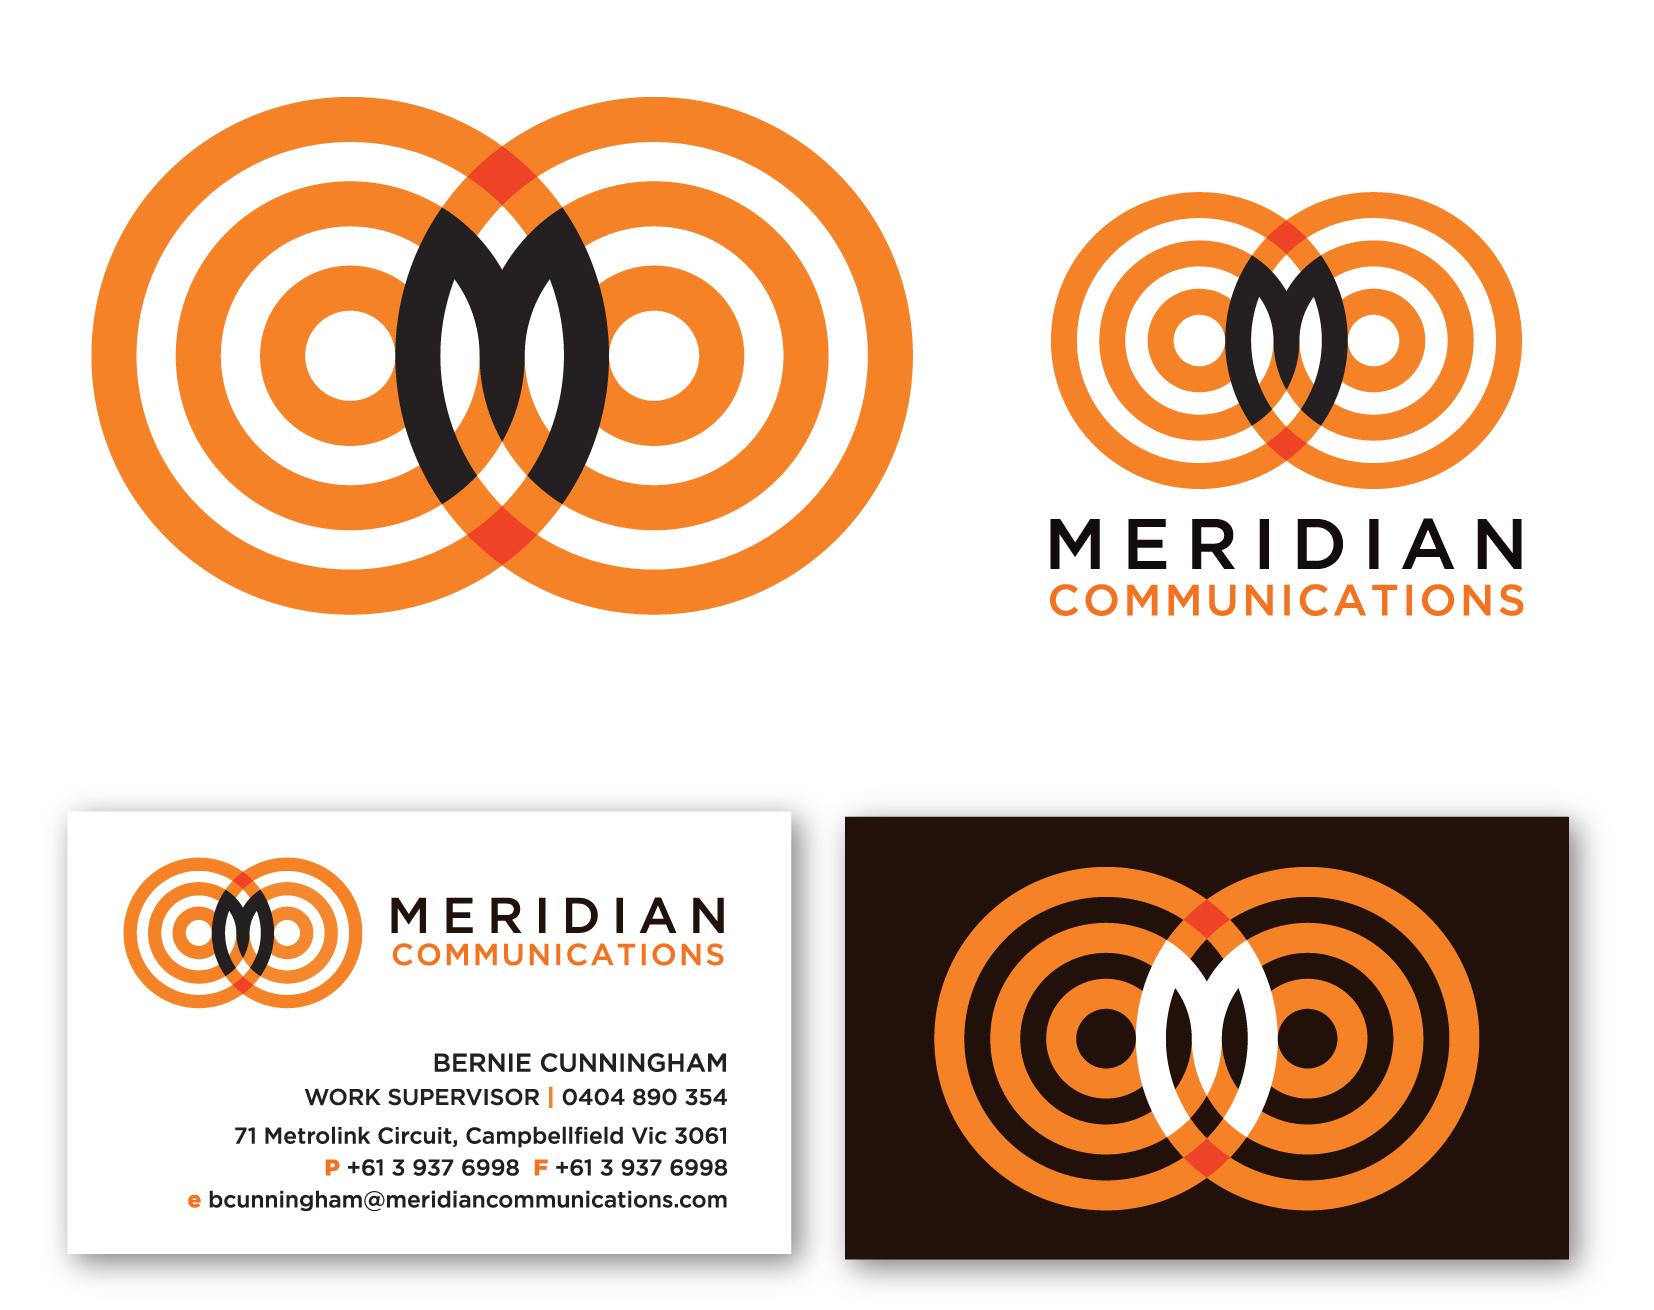 meridiancommunication.jpg